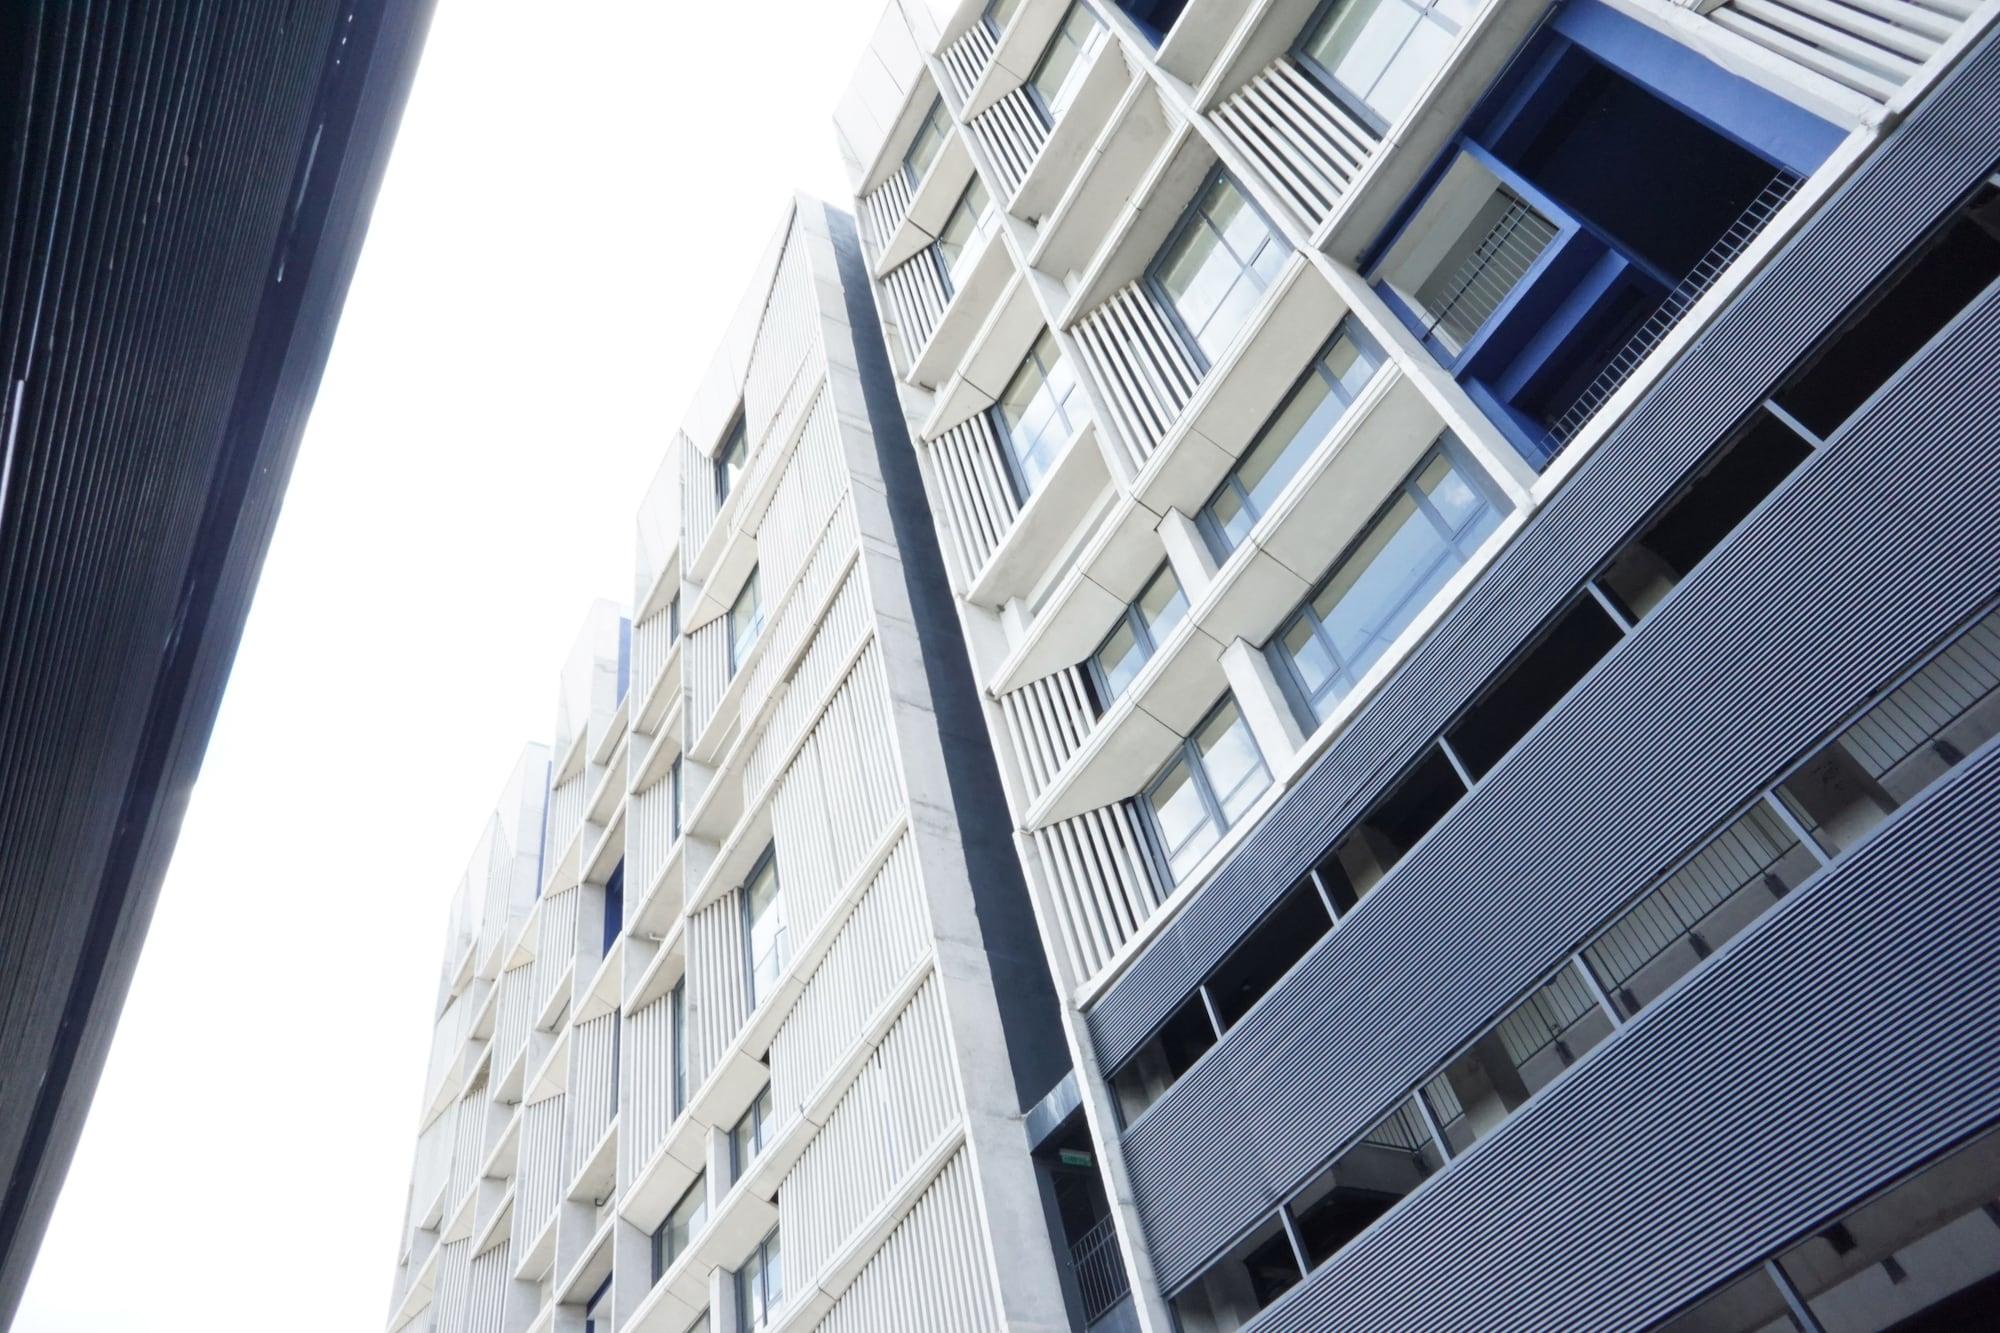 Tamarind Suites by Superhost Management, Kuala Lumpur